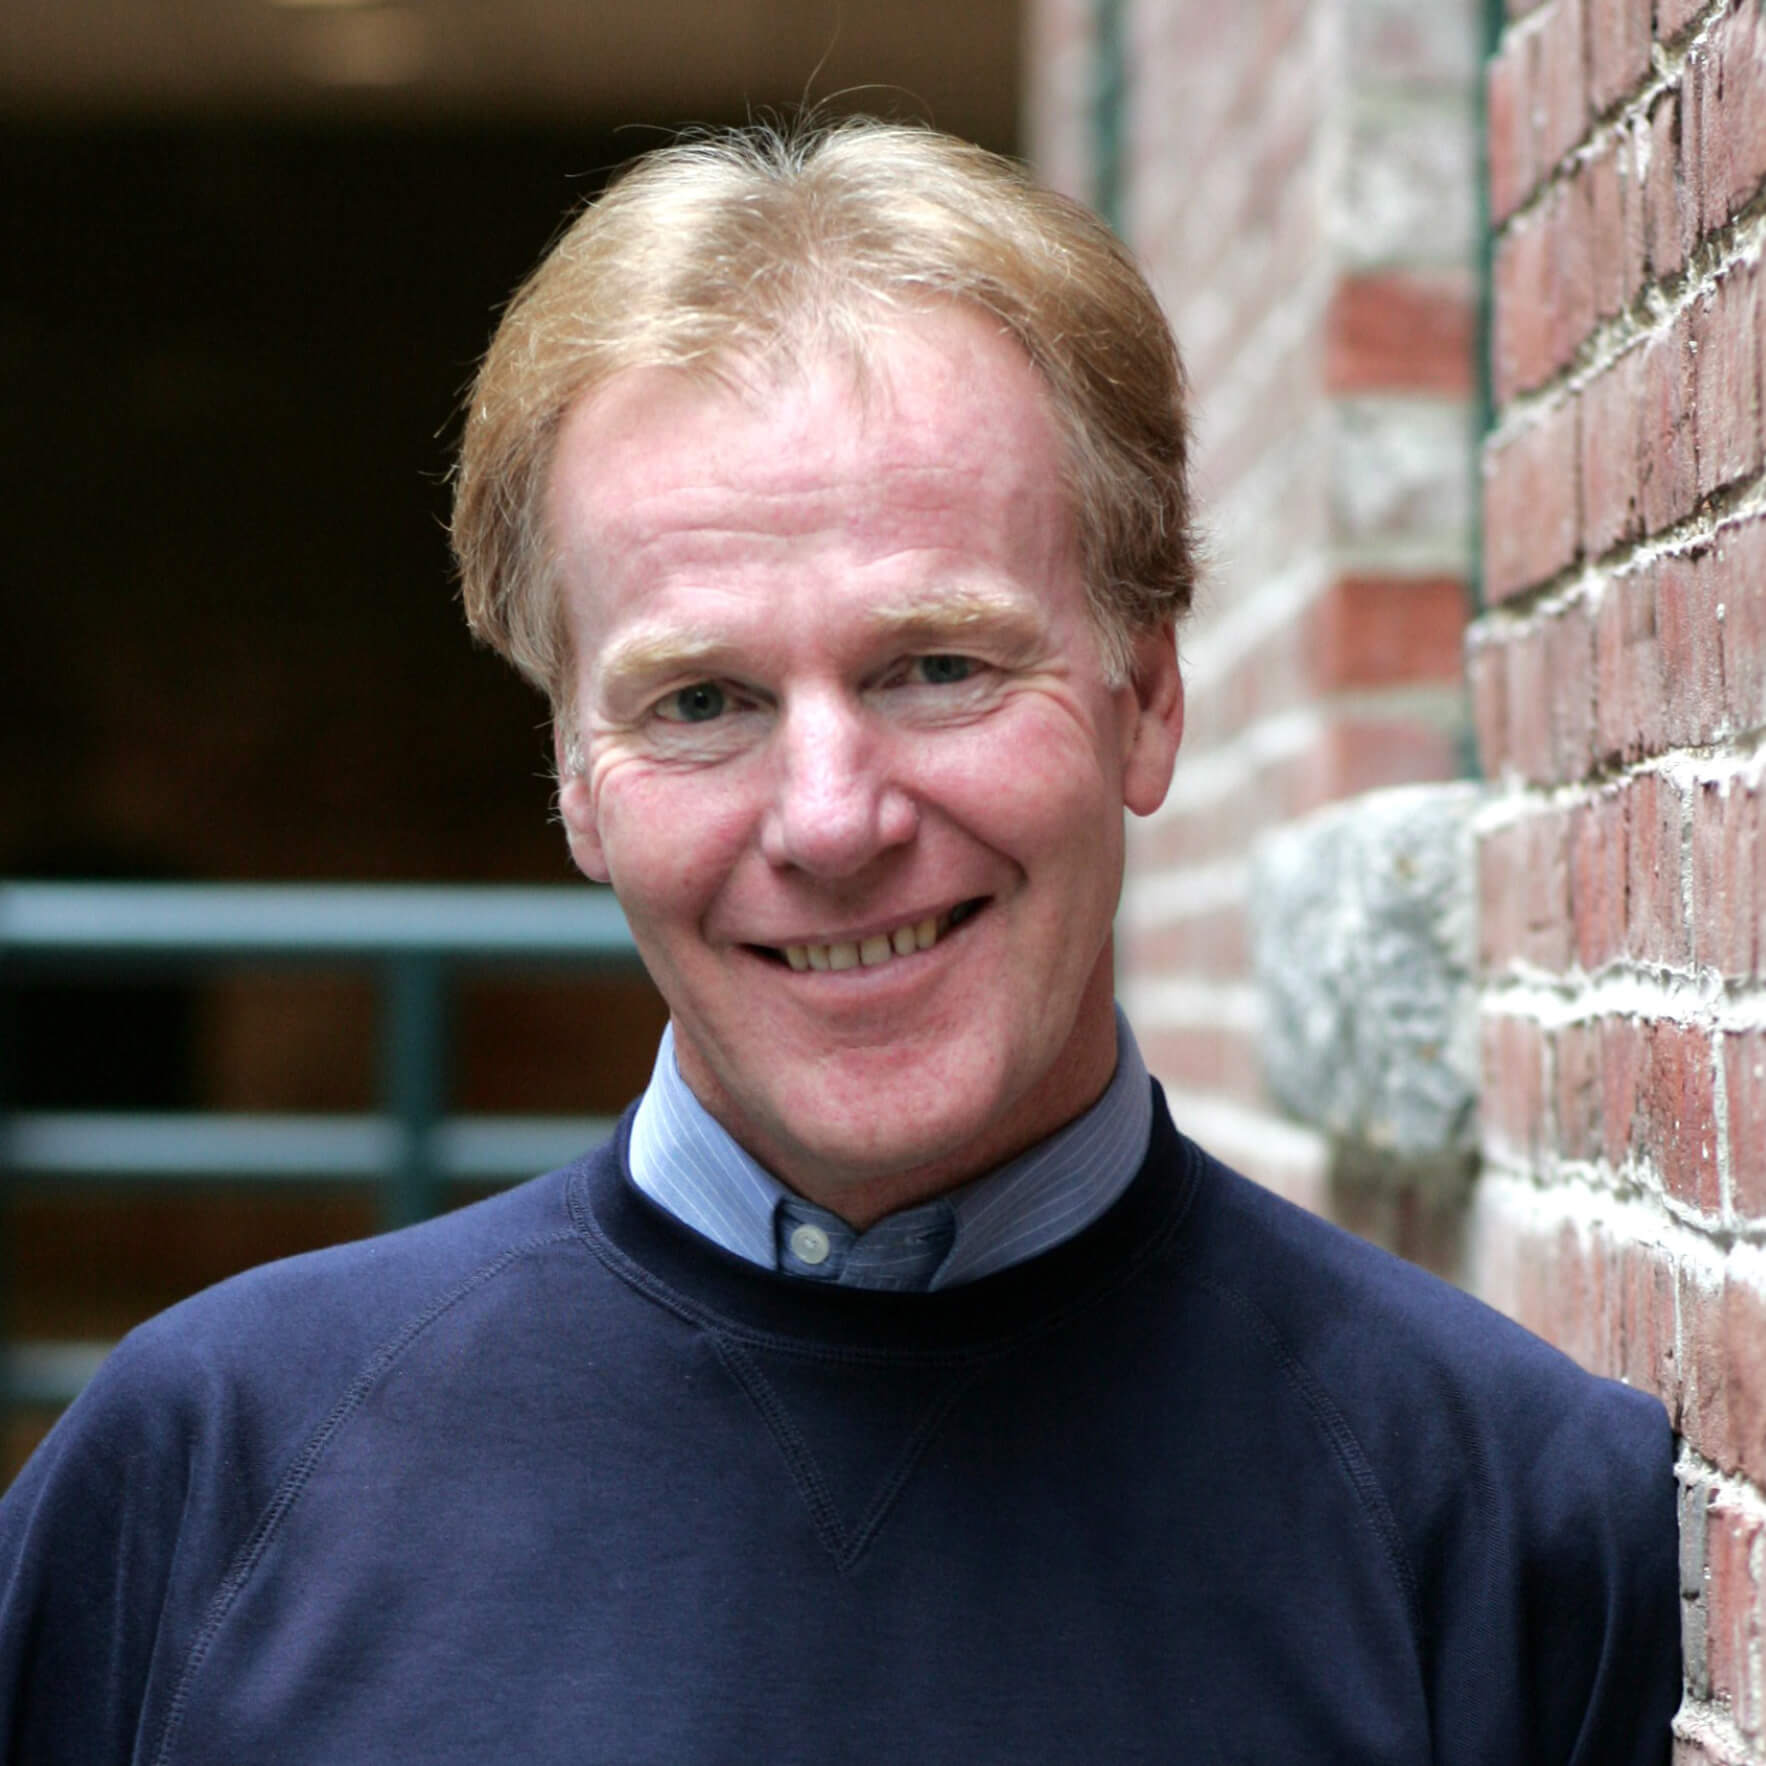 Headshot of Peter Senge, author of The Fifth Discipline